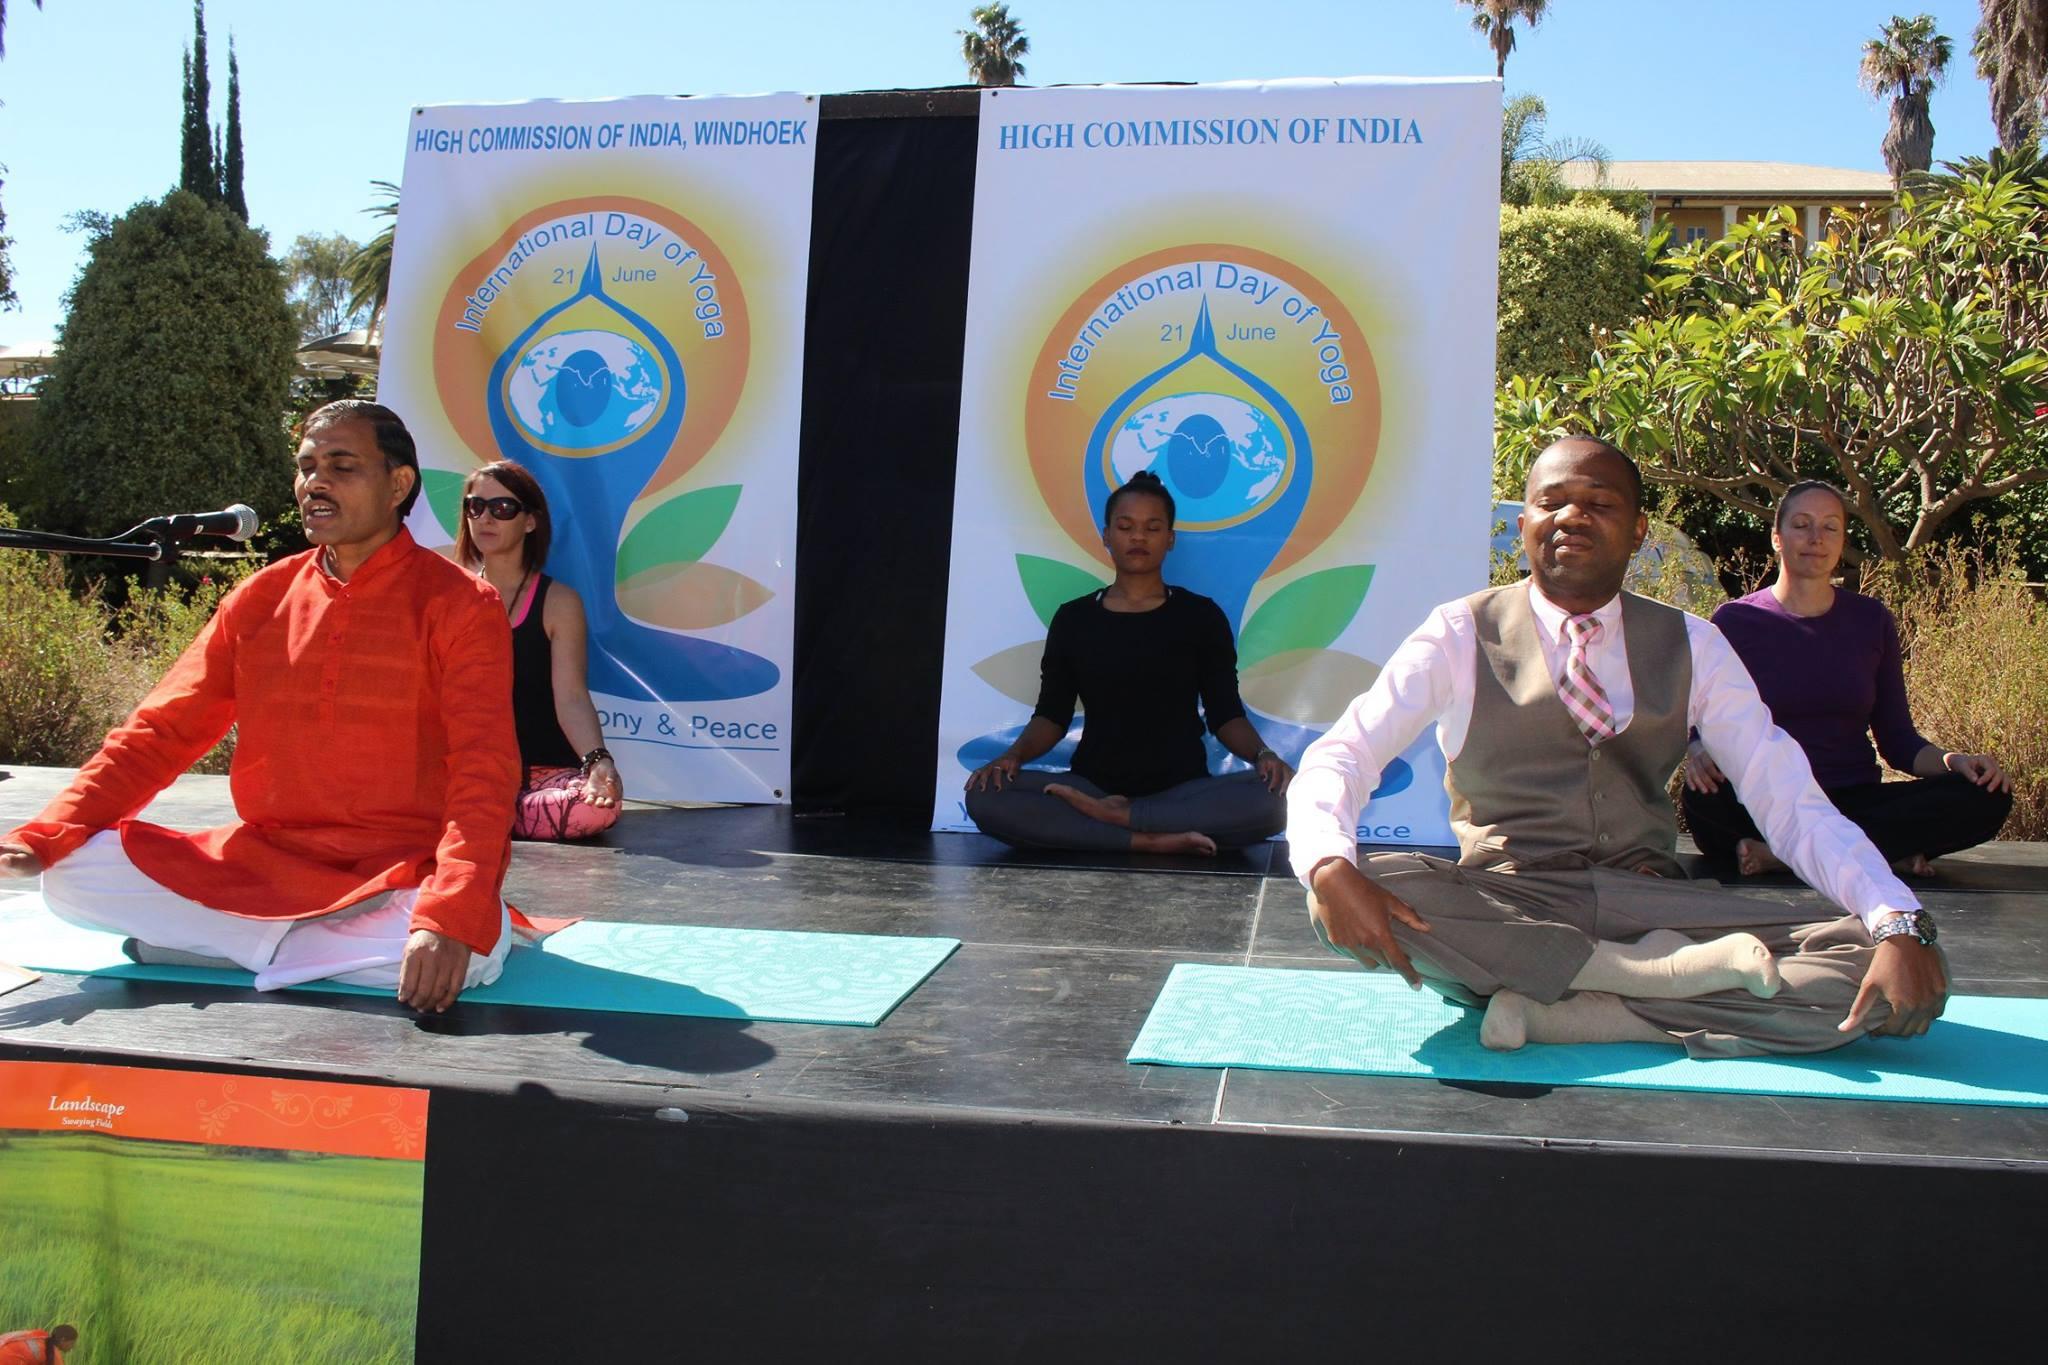 Linda at the International Yoga Day in Windhoek